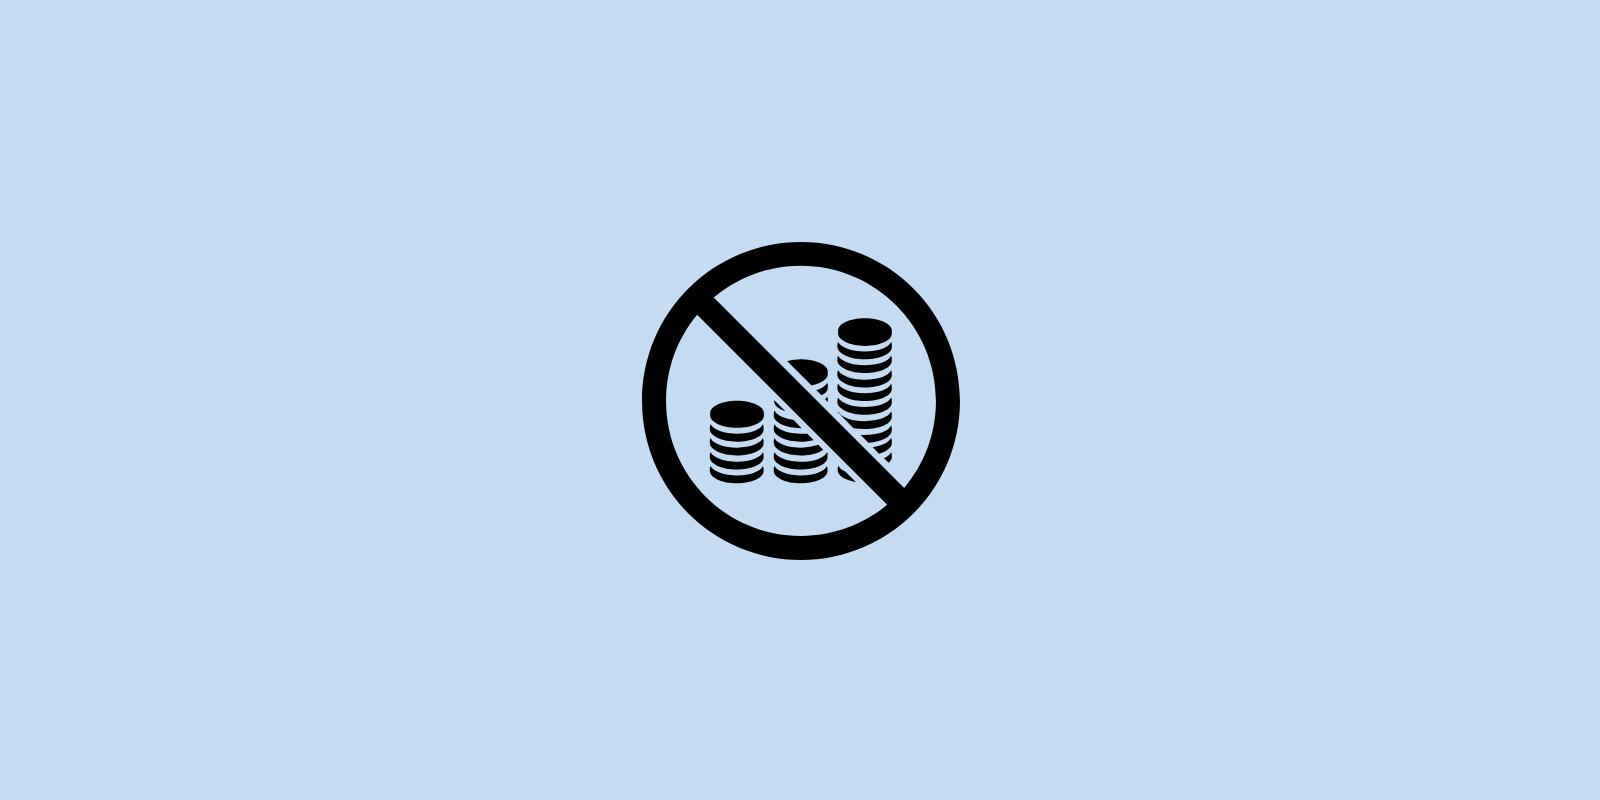 No coins